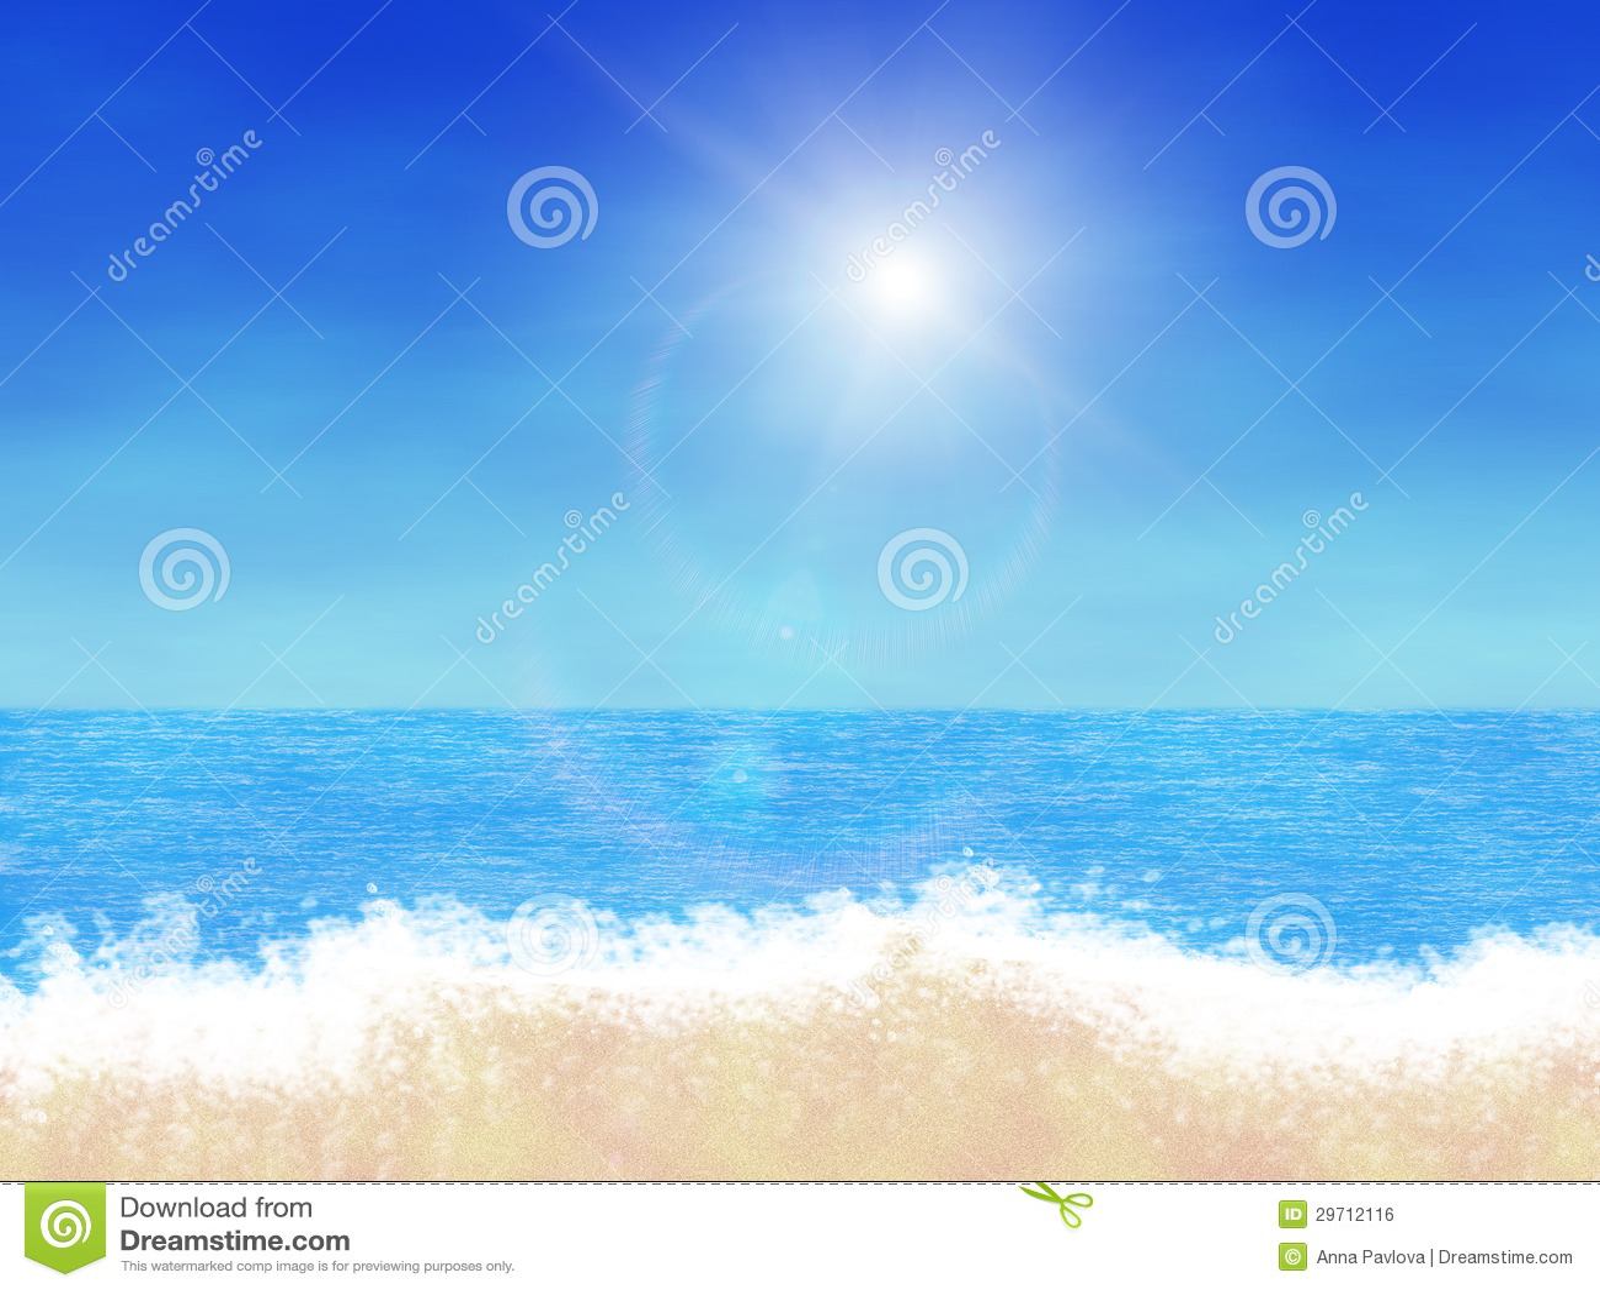 Cartoon Beach Royalty Free Stock Image Image 29712116